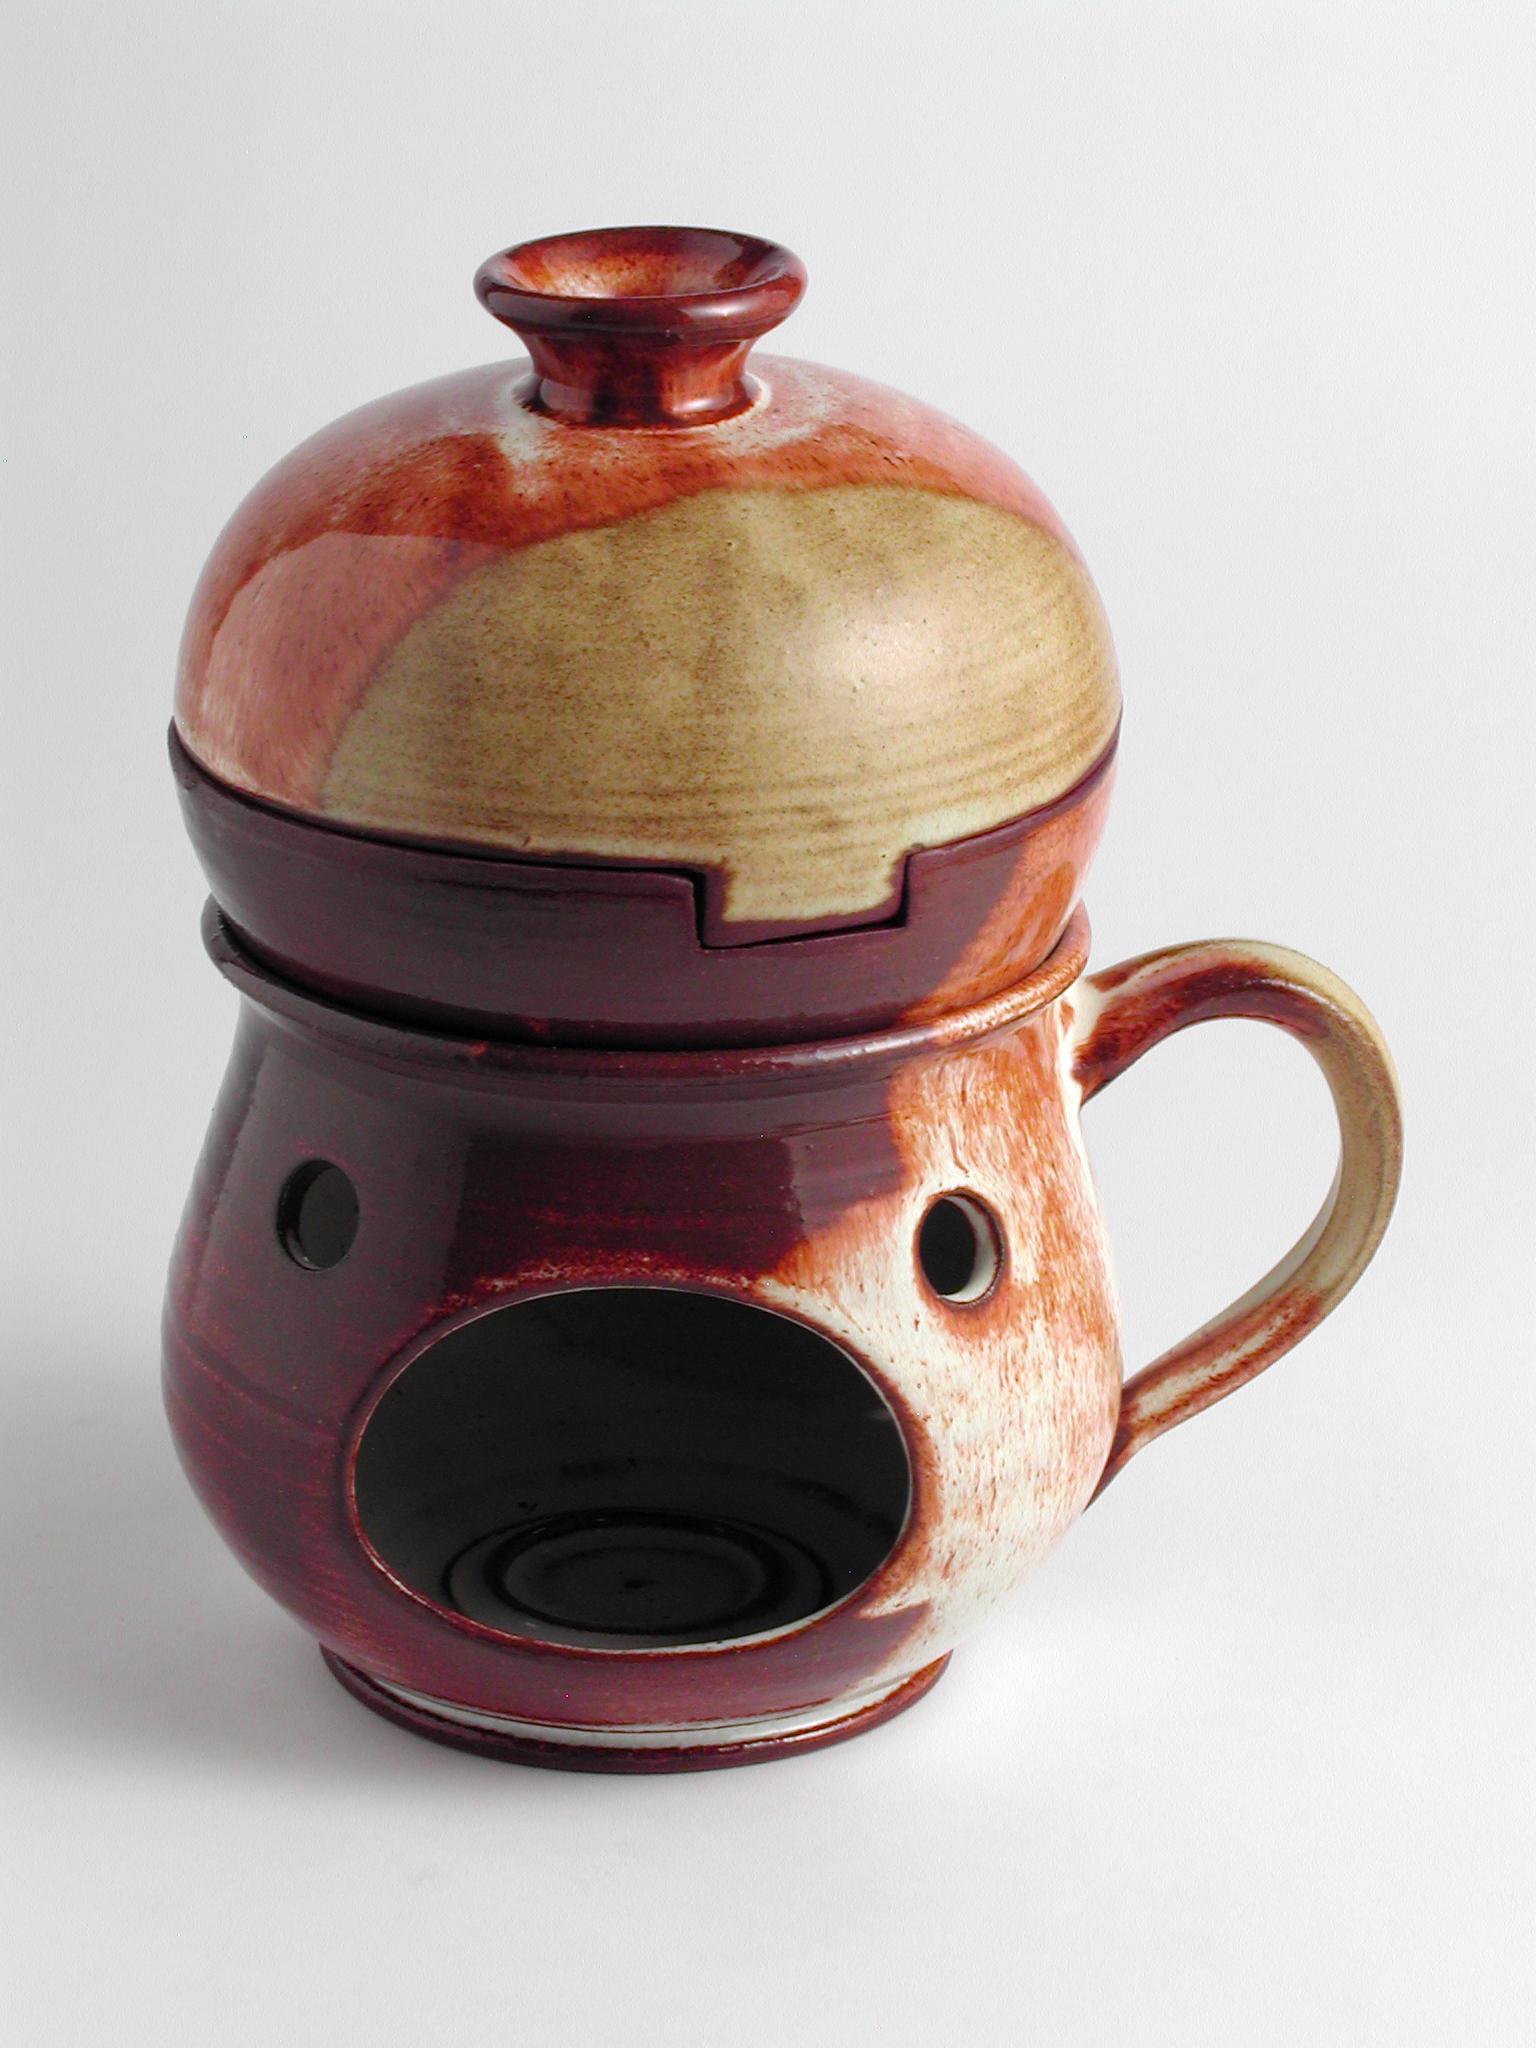 Nabídka keramiky